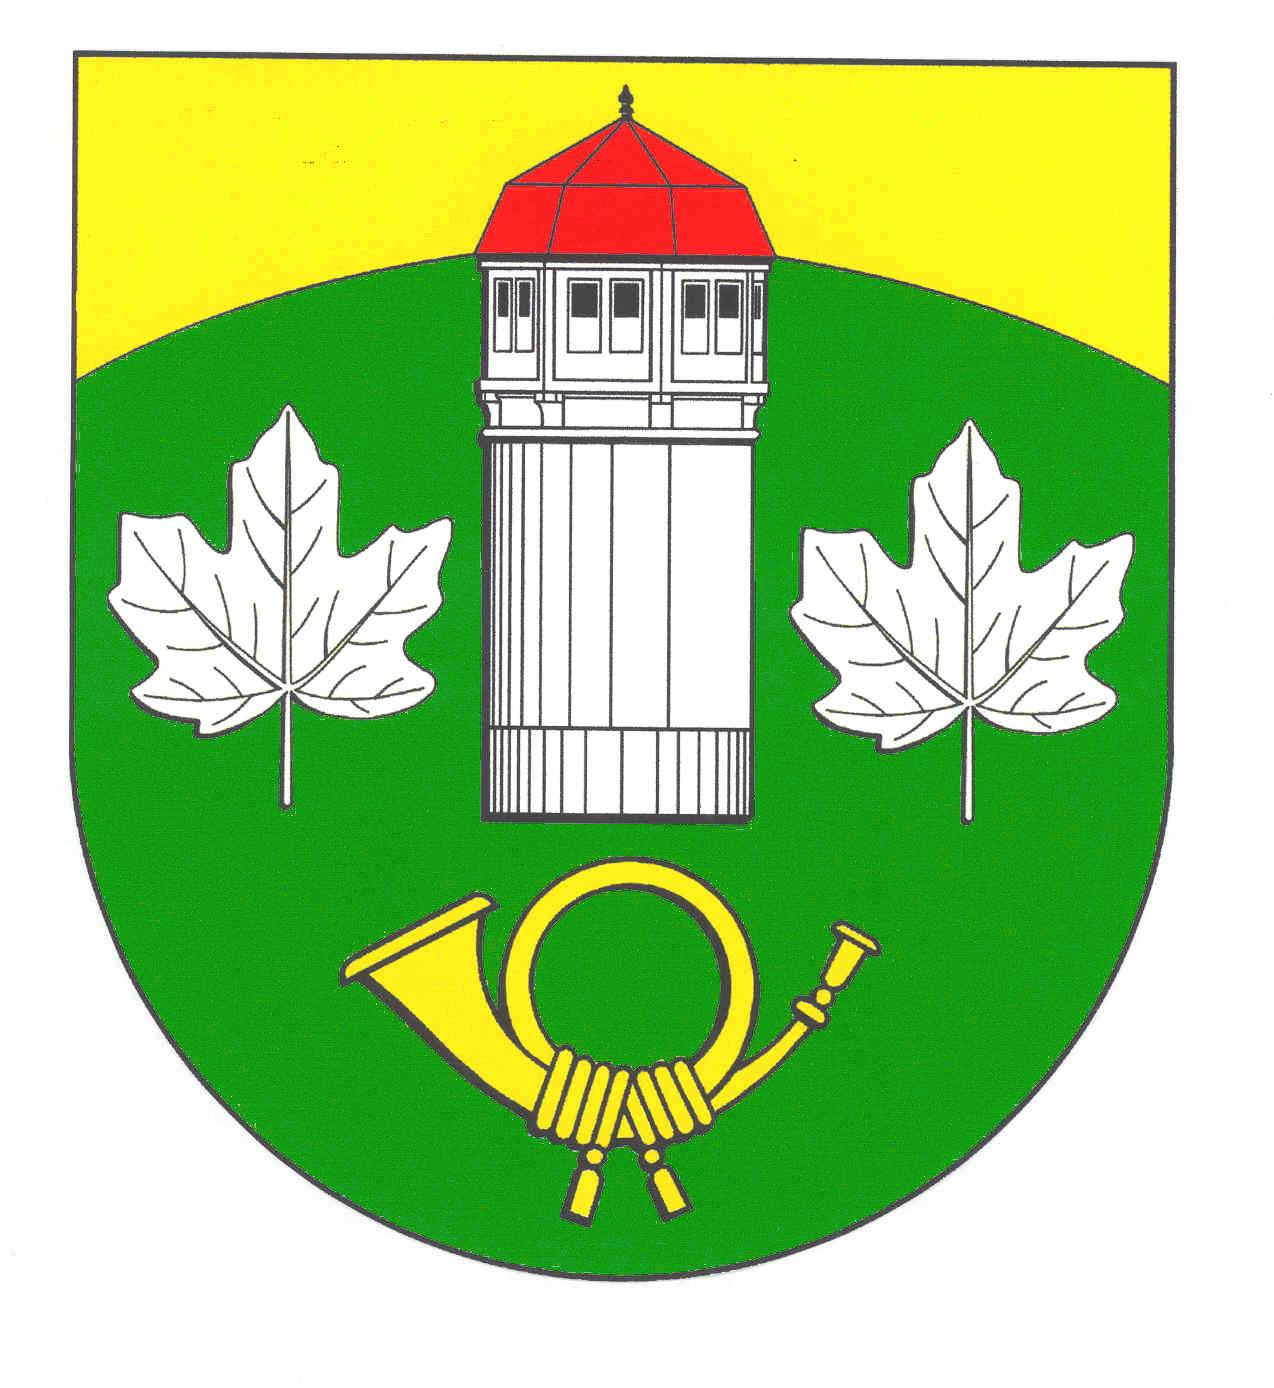 Wappen GemeindeRemmels, Kreis Rendsburg-Eckernförde